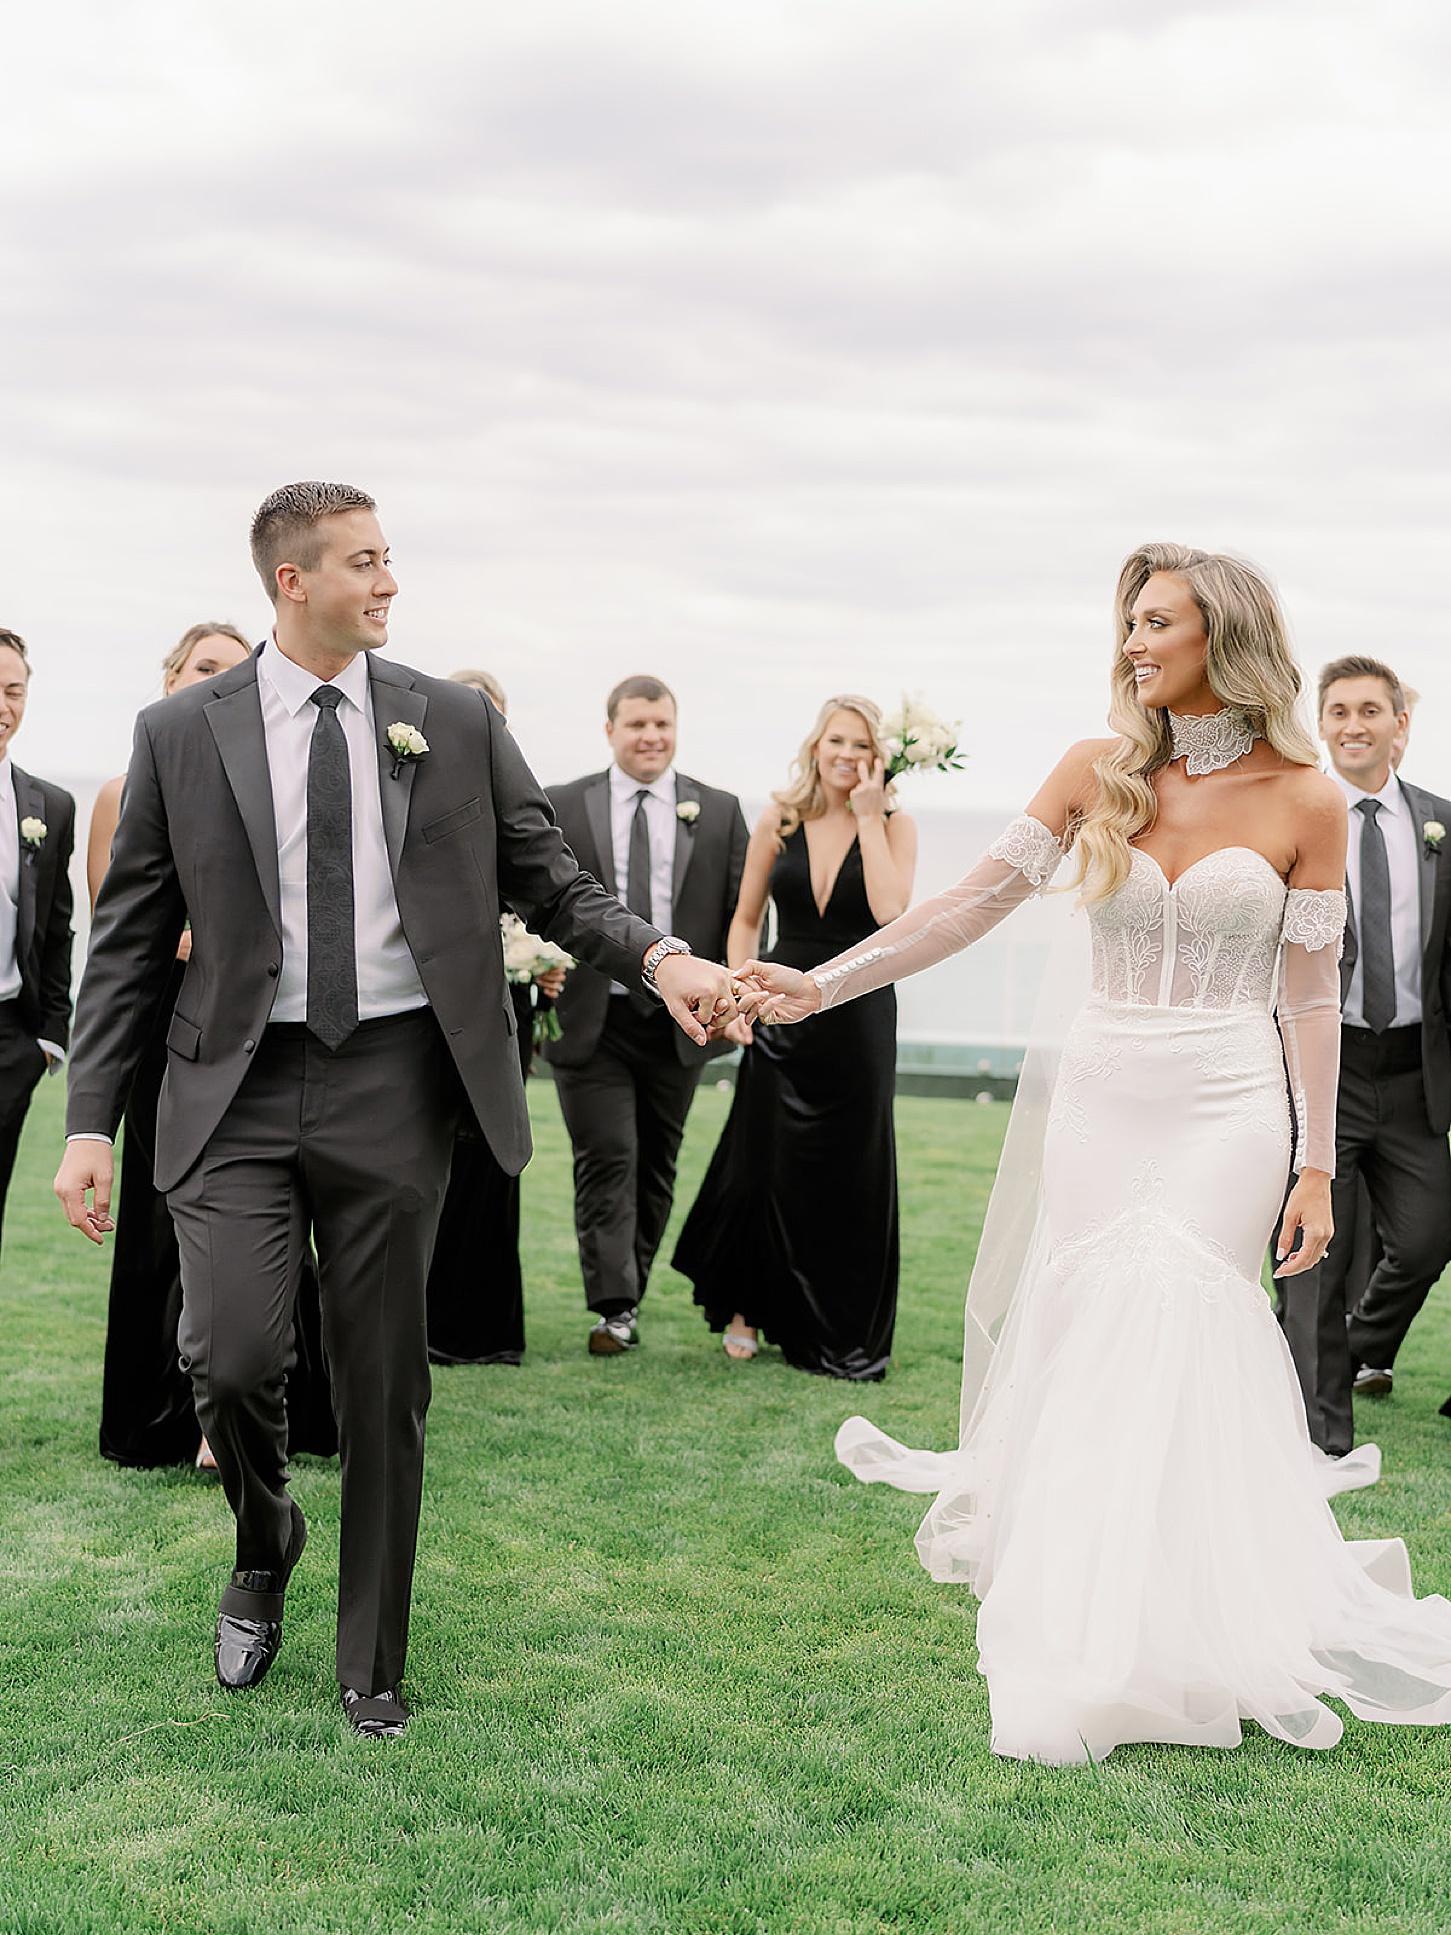 Atlantic City Wedding Photography Studio by Magdalena Studios Lexy Cha 0041